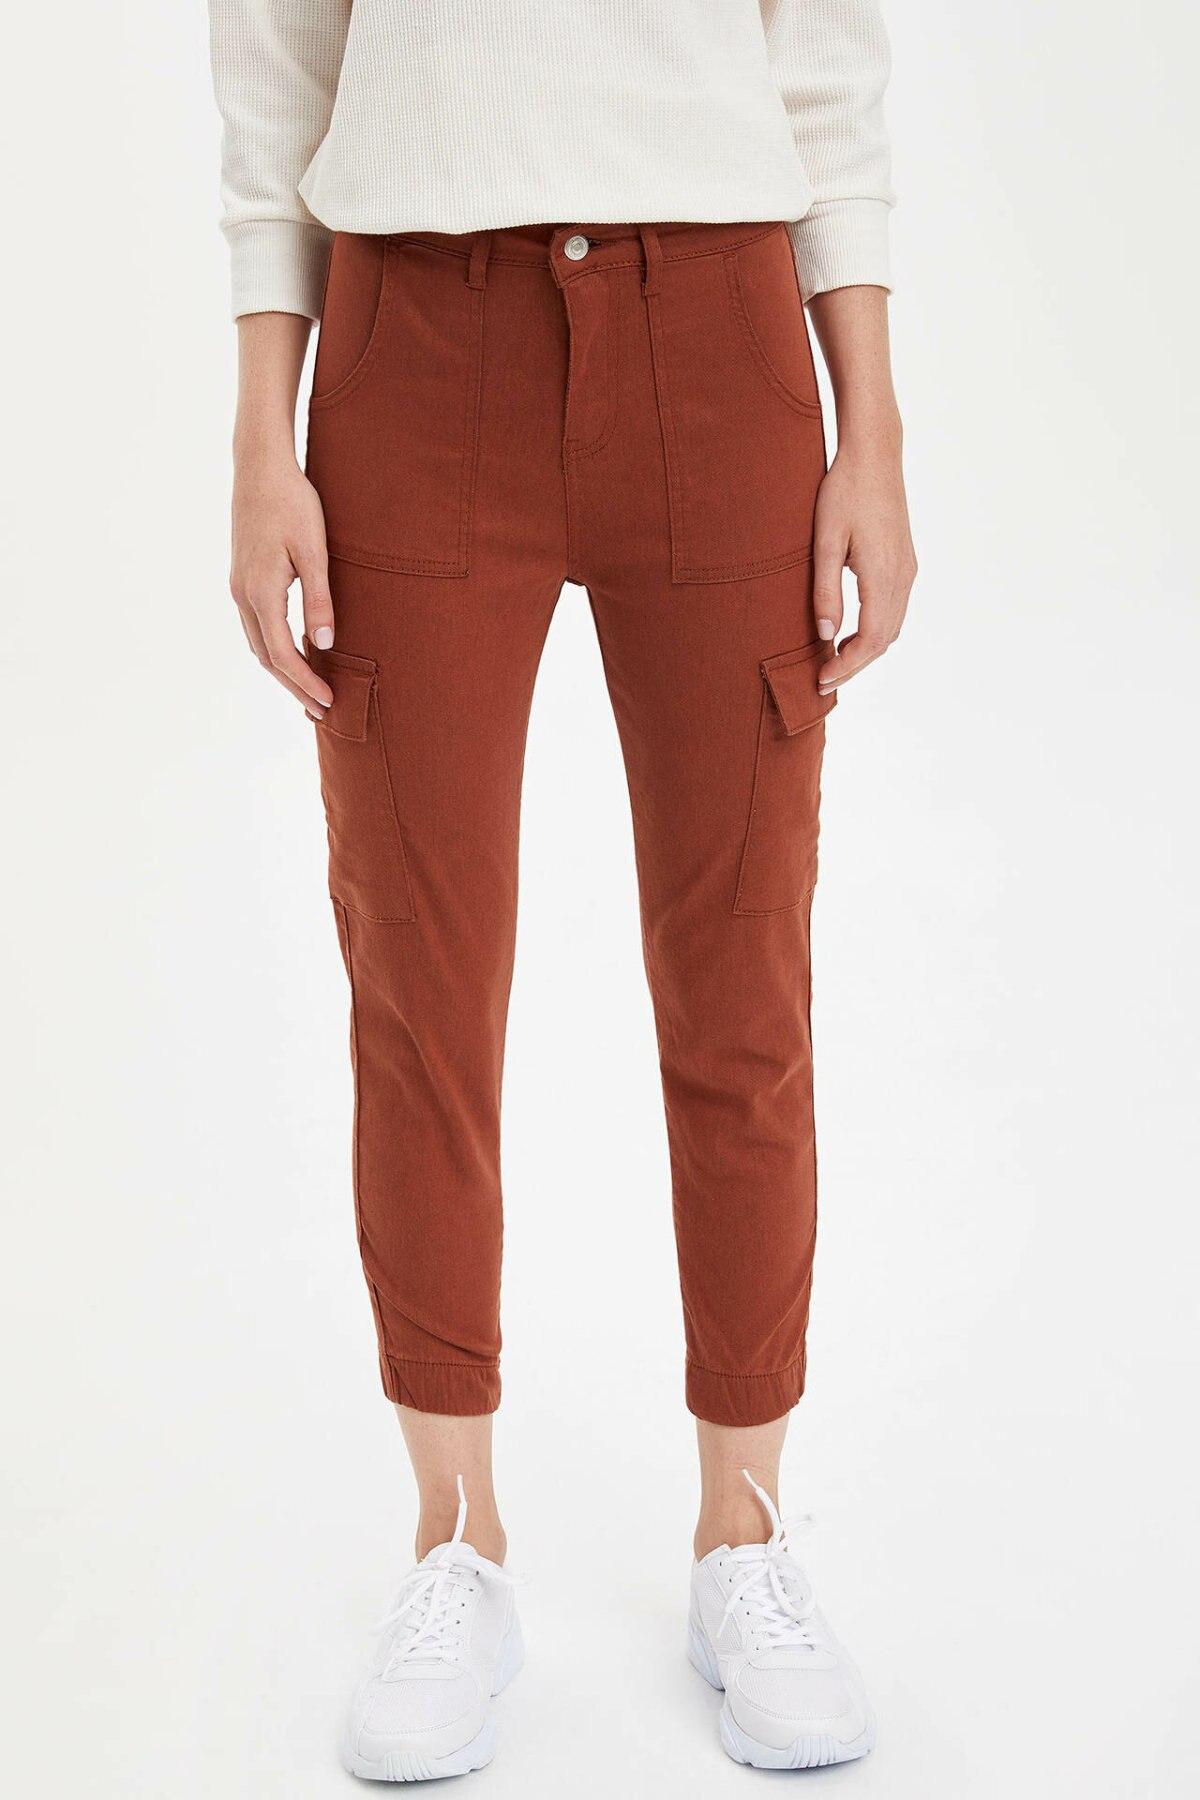 DeFacto Woman Cargo Crop Pants Fashion Solid Pockets Slim Trousers Womens Casual Mid Waist Leisure Pants Female- M0827AZ19AU